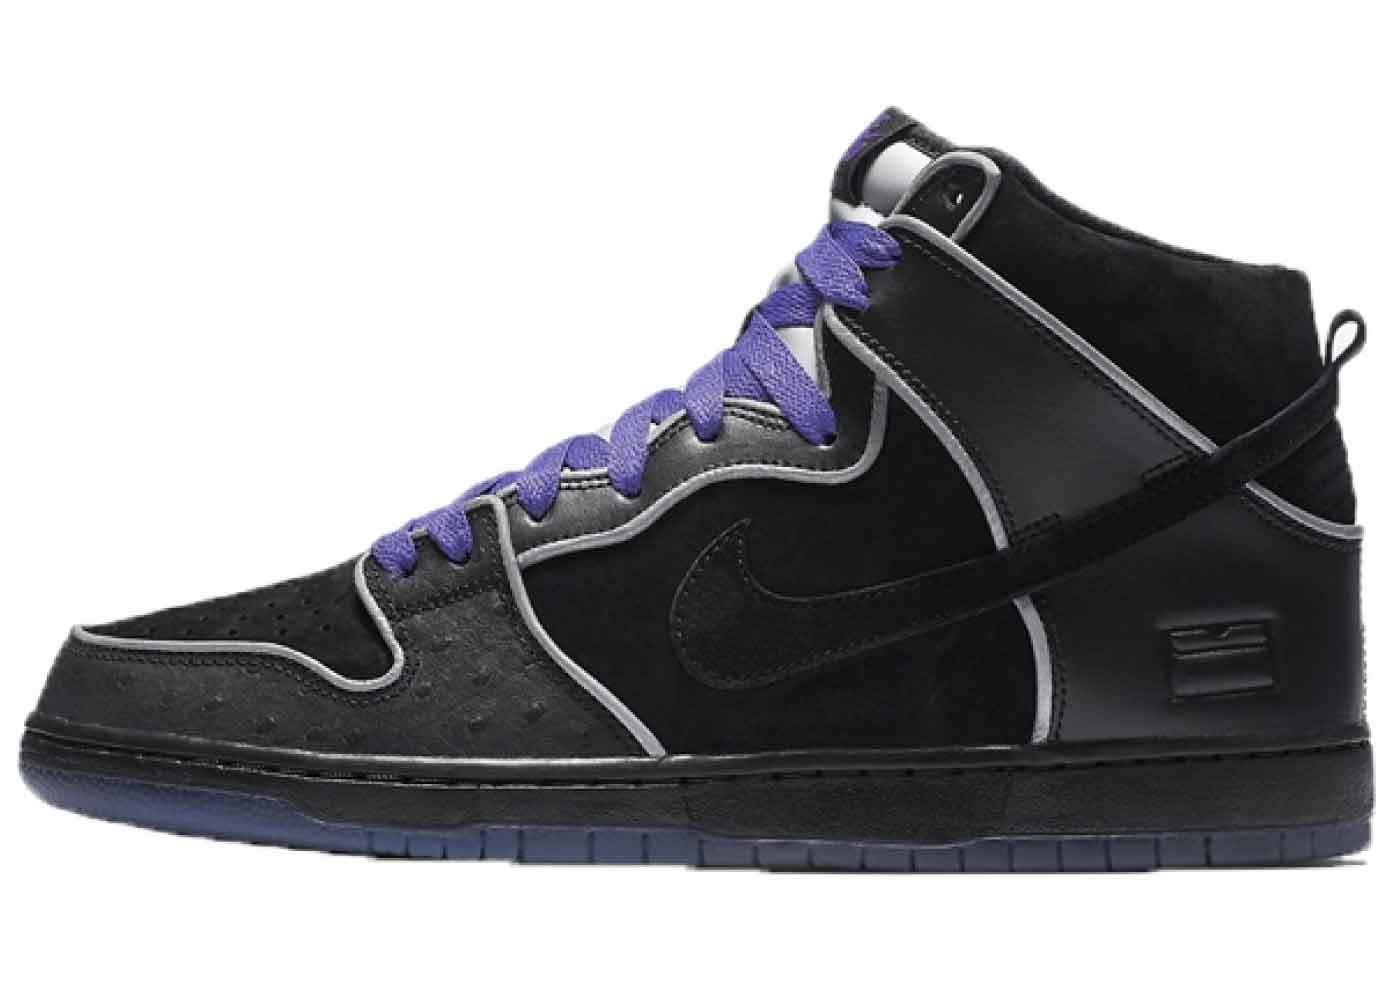 Nike SB Dunk High Black Purple Boxの写真